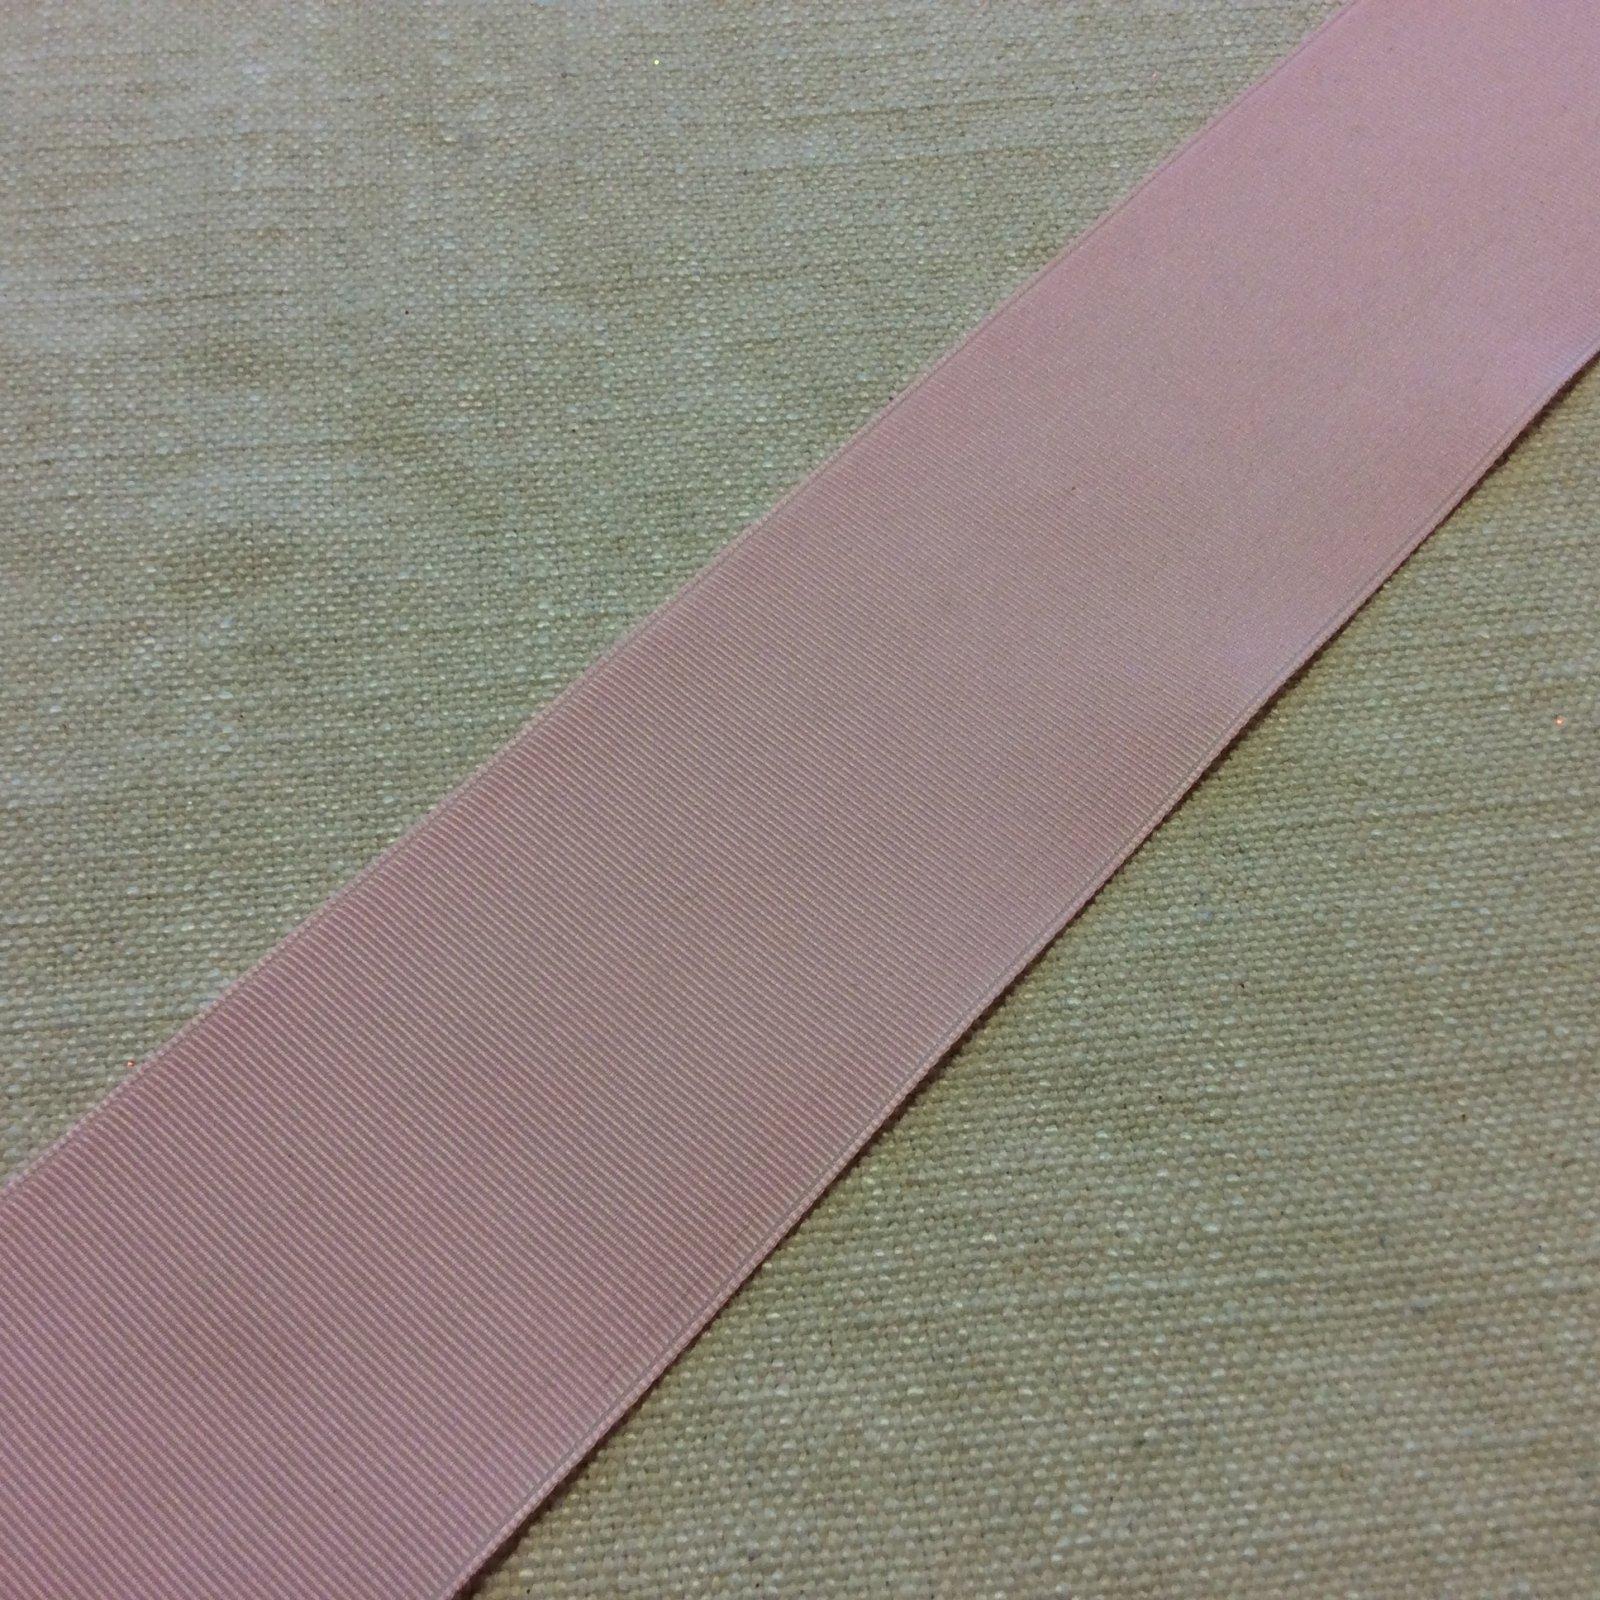 Grosgrain Ribbon 2.5 Light Pink Trim Ribbon RIB1134